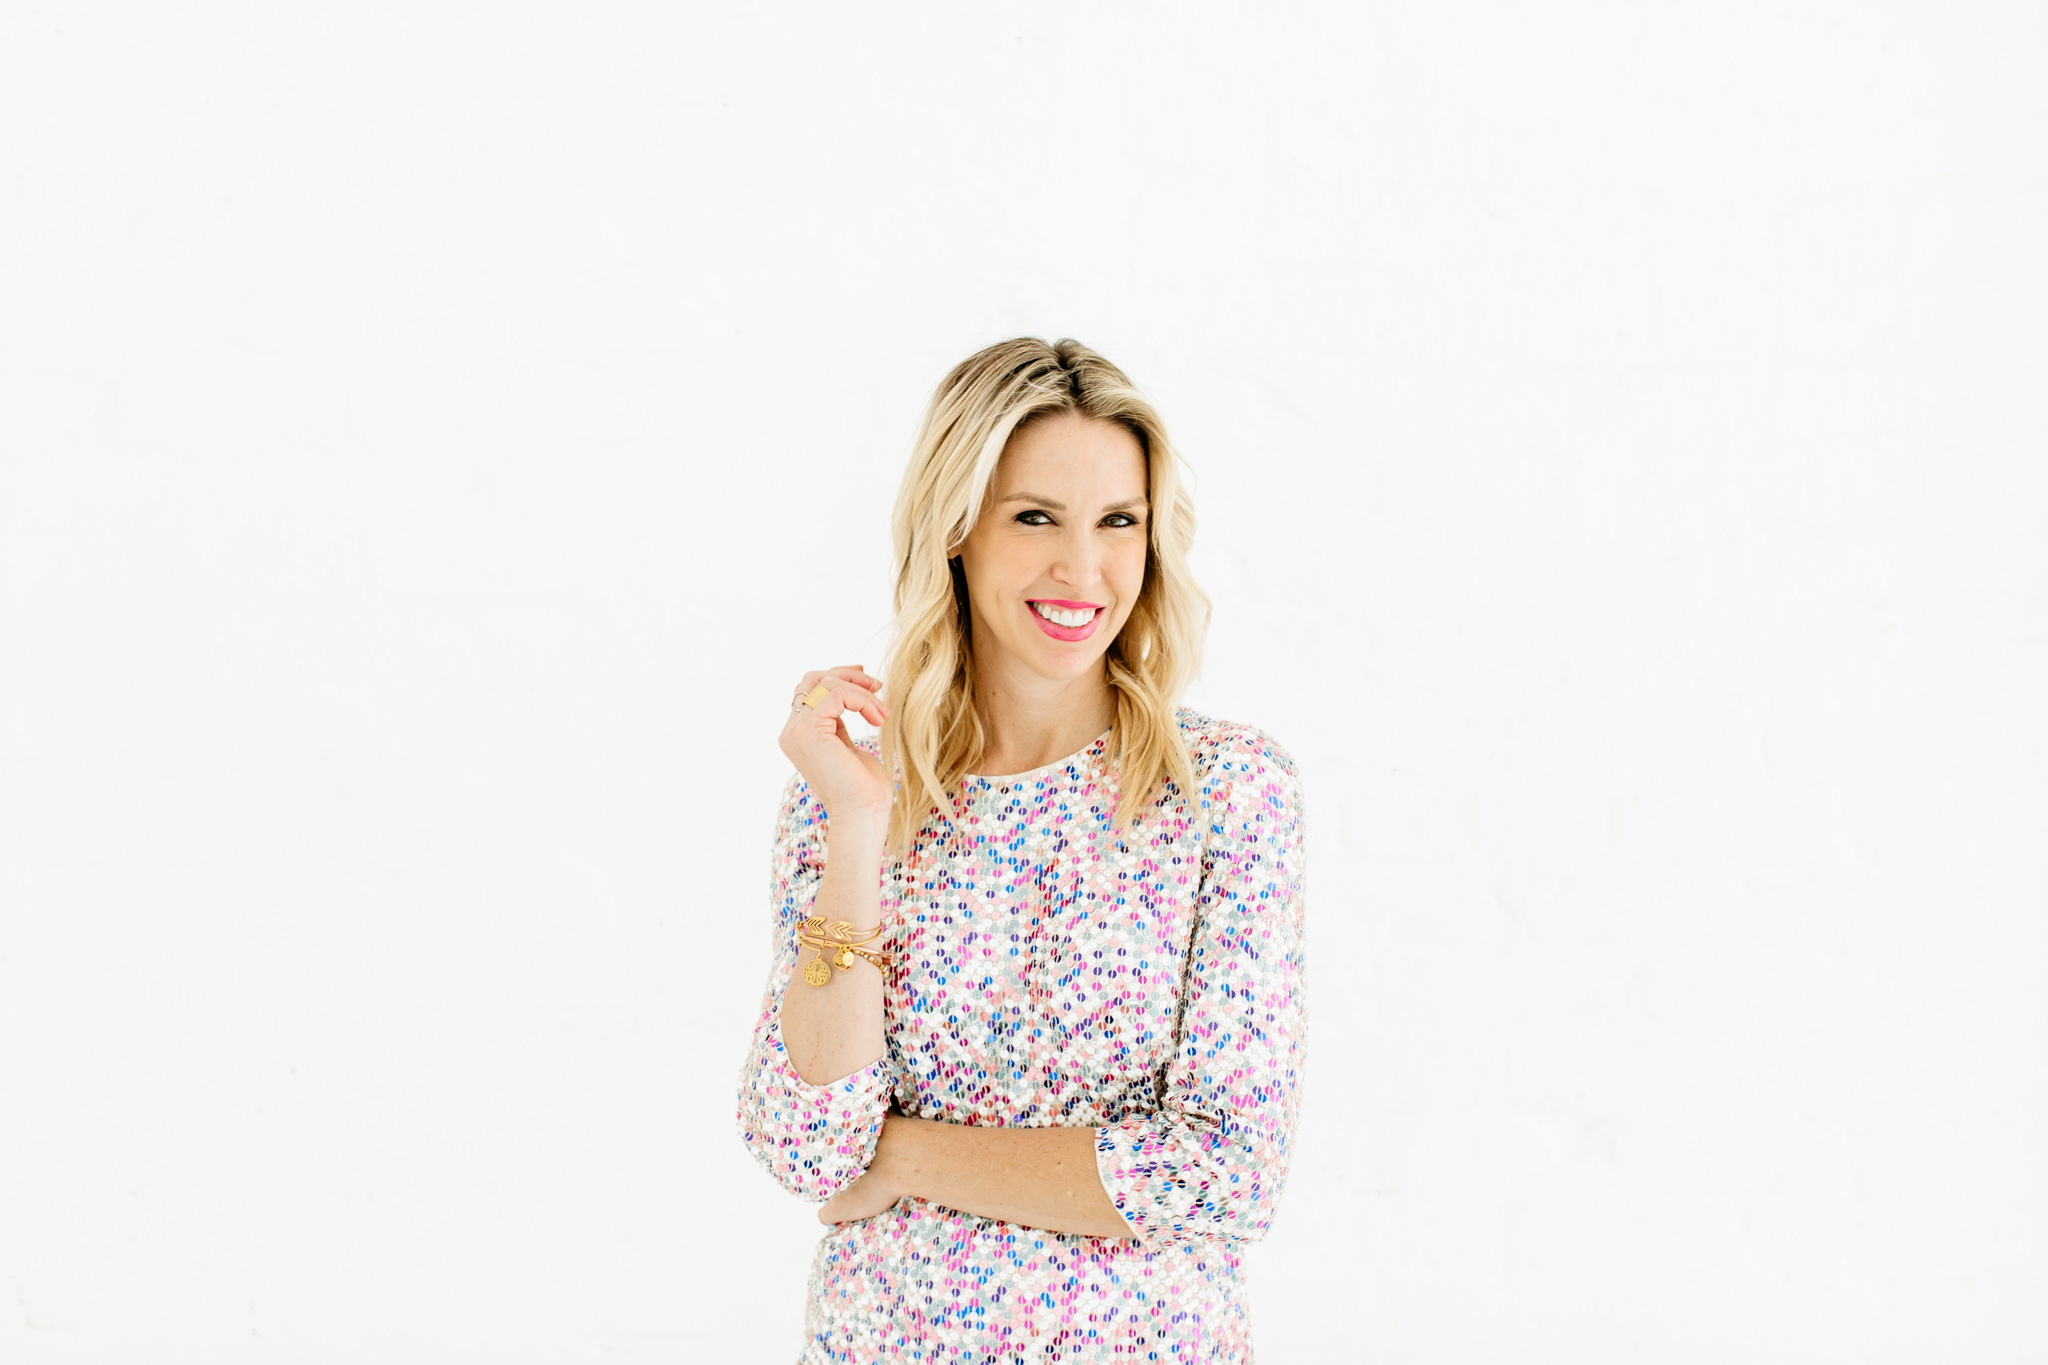 Alexa-Vossler-Photo_Dallas-Headshot-Photographer_Photoshoot-at-the-Lumen-Room-with-Lauren-Stohlman-1.jpg